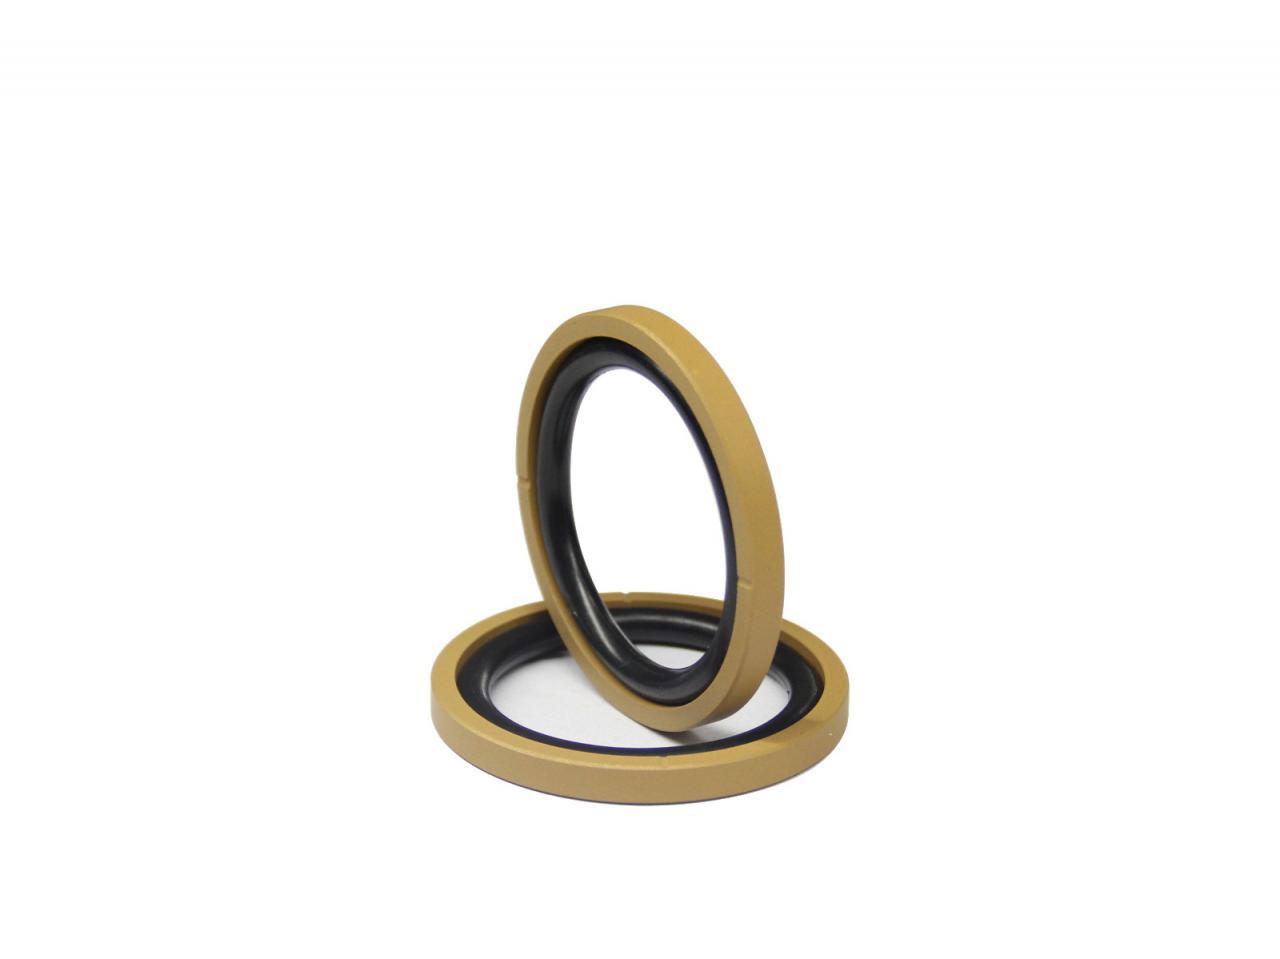 DSH-Piston Seal Design | Piston Seal Bronze Filled PTFE Glyd Ring-5